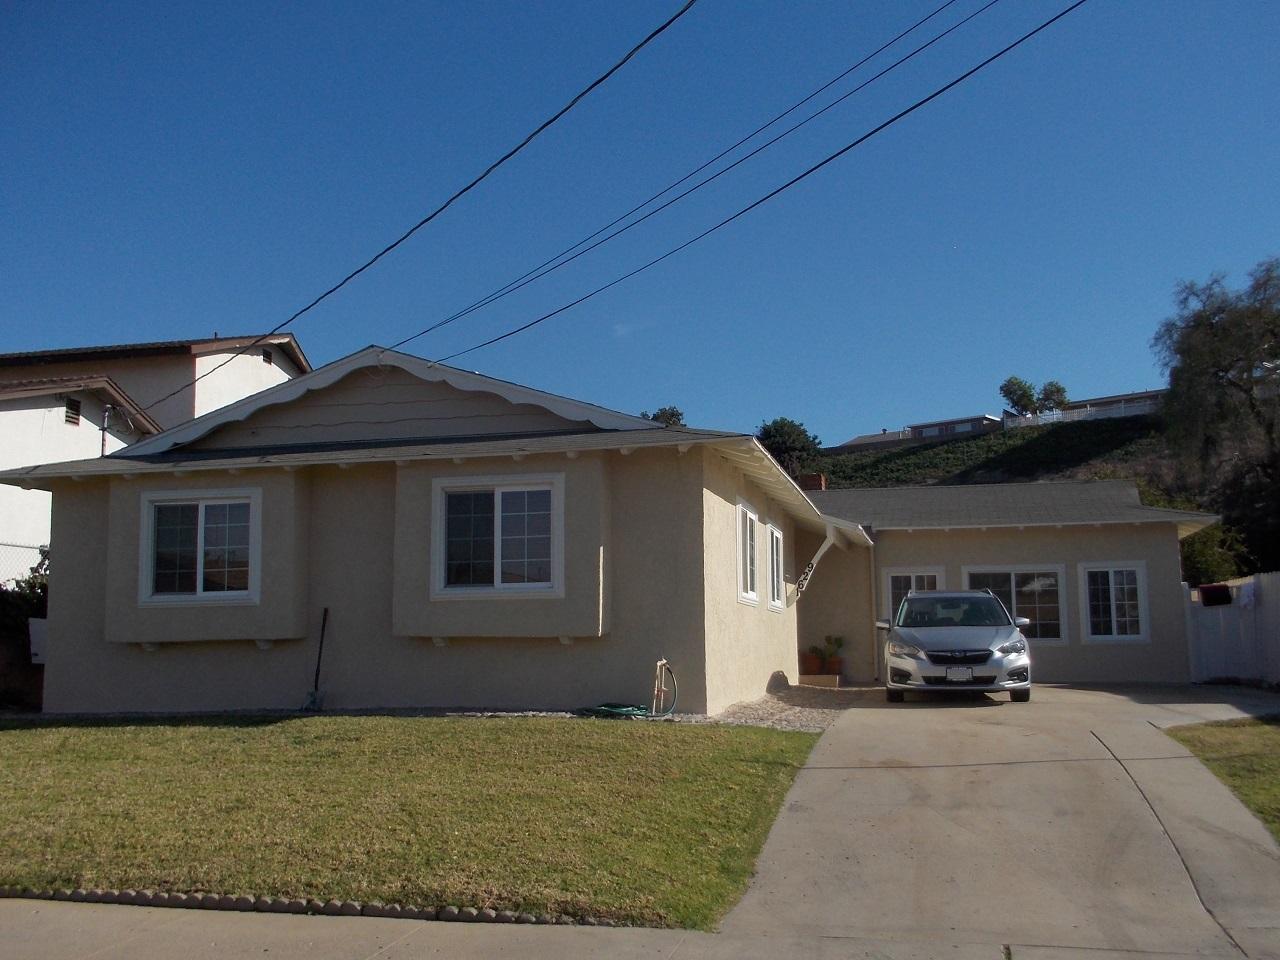 1629 Primera St, Lemon Grove, CA 91945